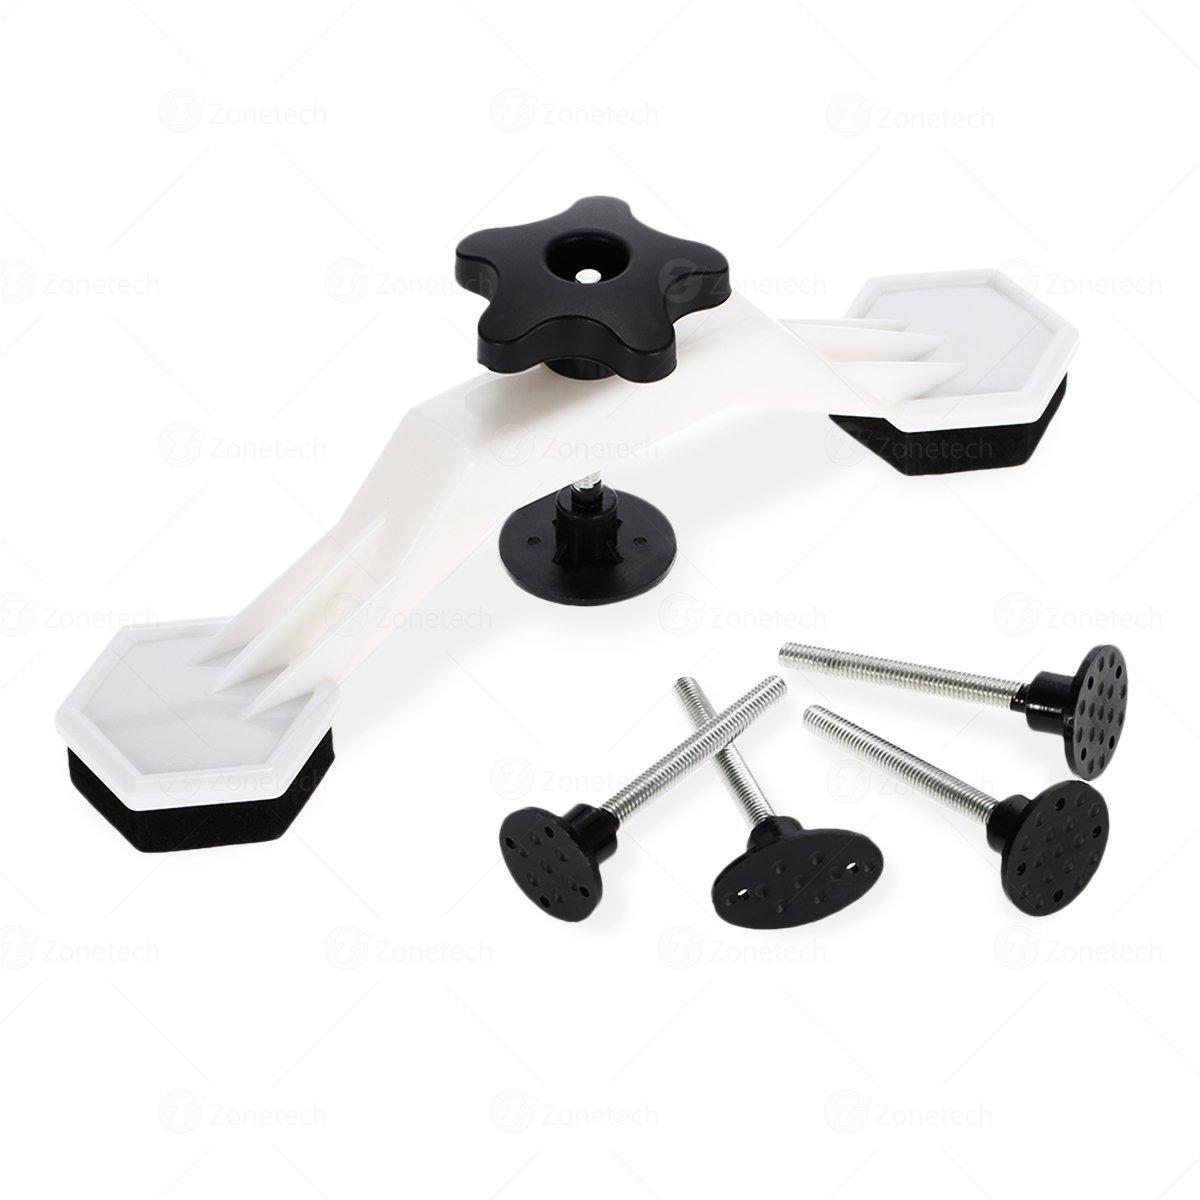 Zone Tech Car Body Dent Repair - Premium Quality Dent Bridge Puller Kit with Hot Melt Glue Gun Glue Sticks